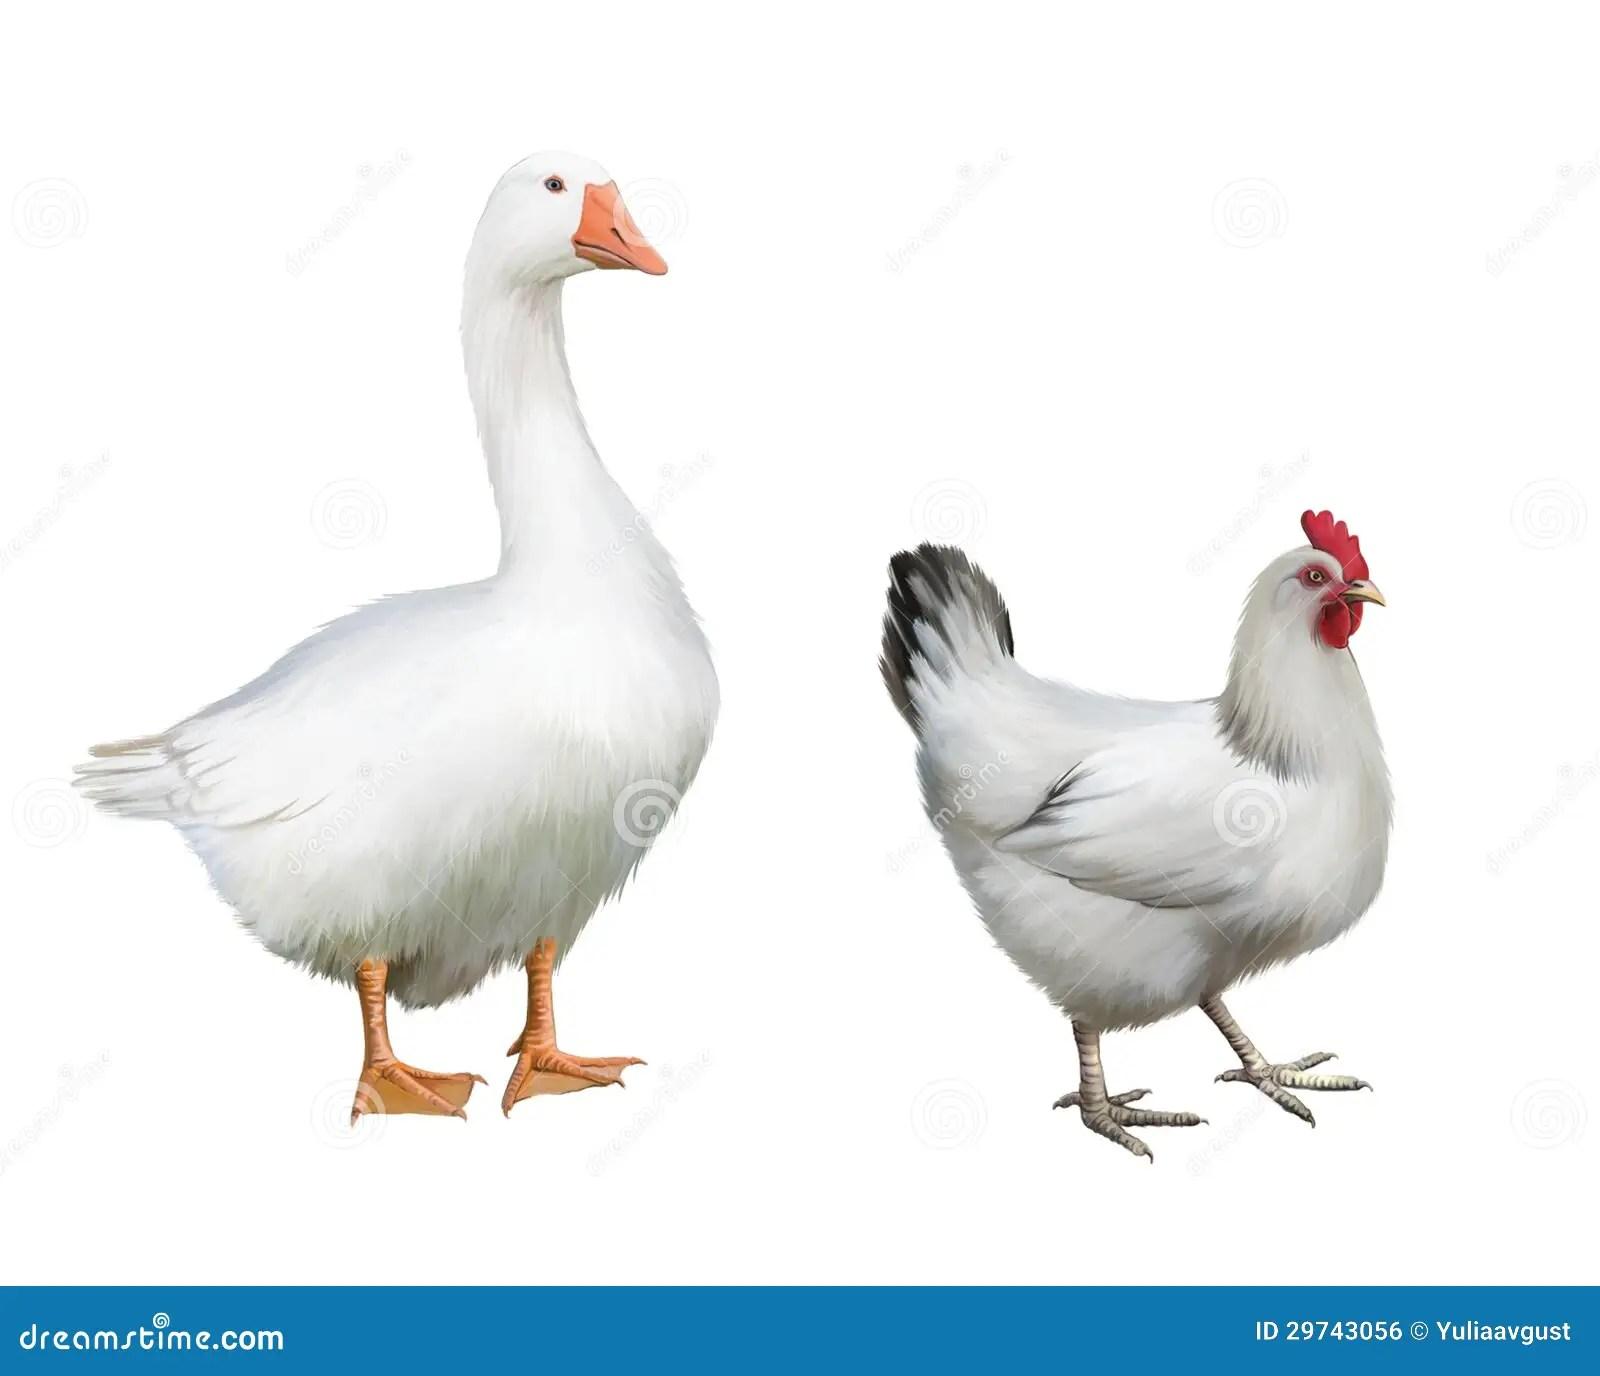 White Goose And White Chicken Stock Illustration